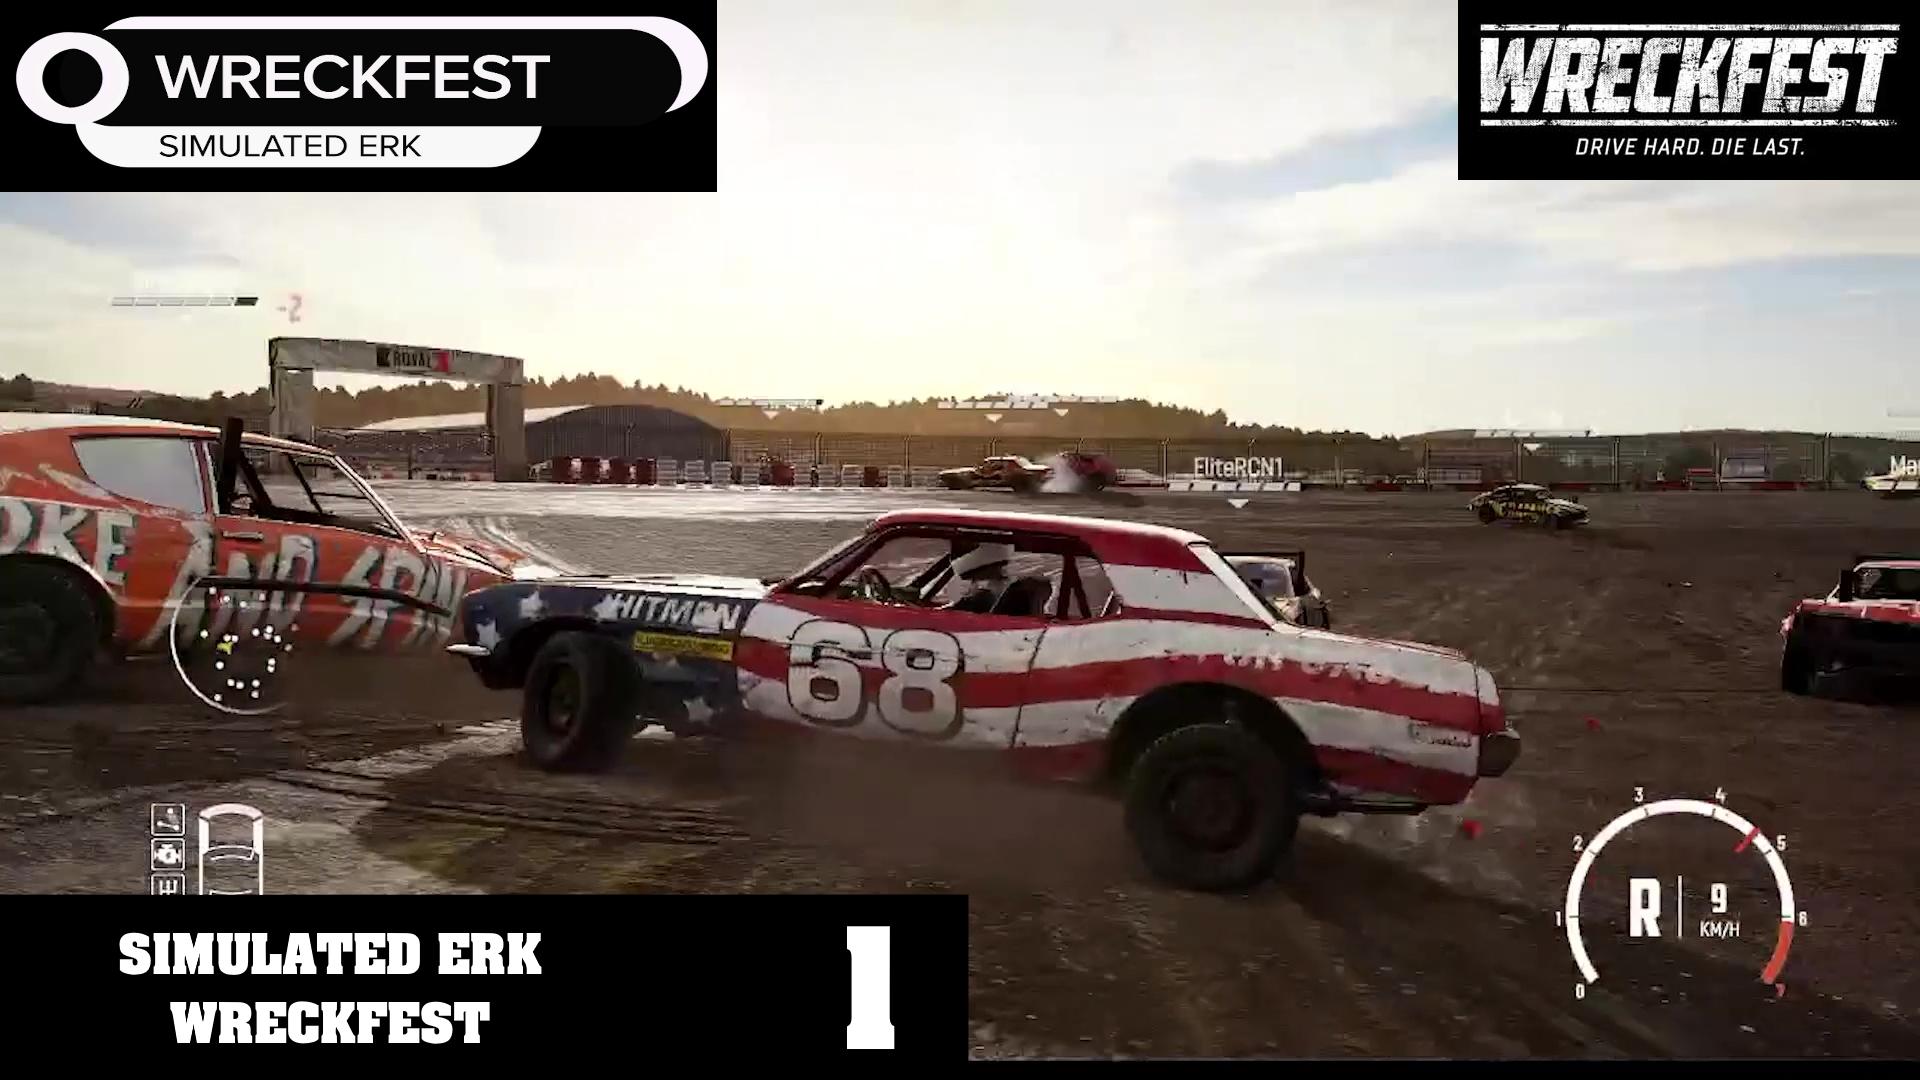 Simulated Erk: Wreckfest episode 1 | Simulated Erk The Rookie